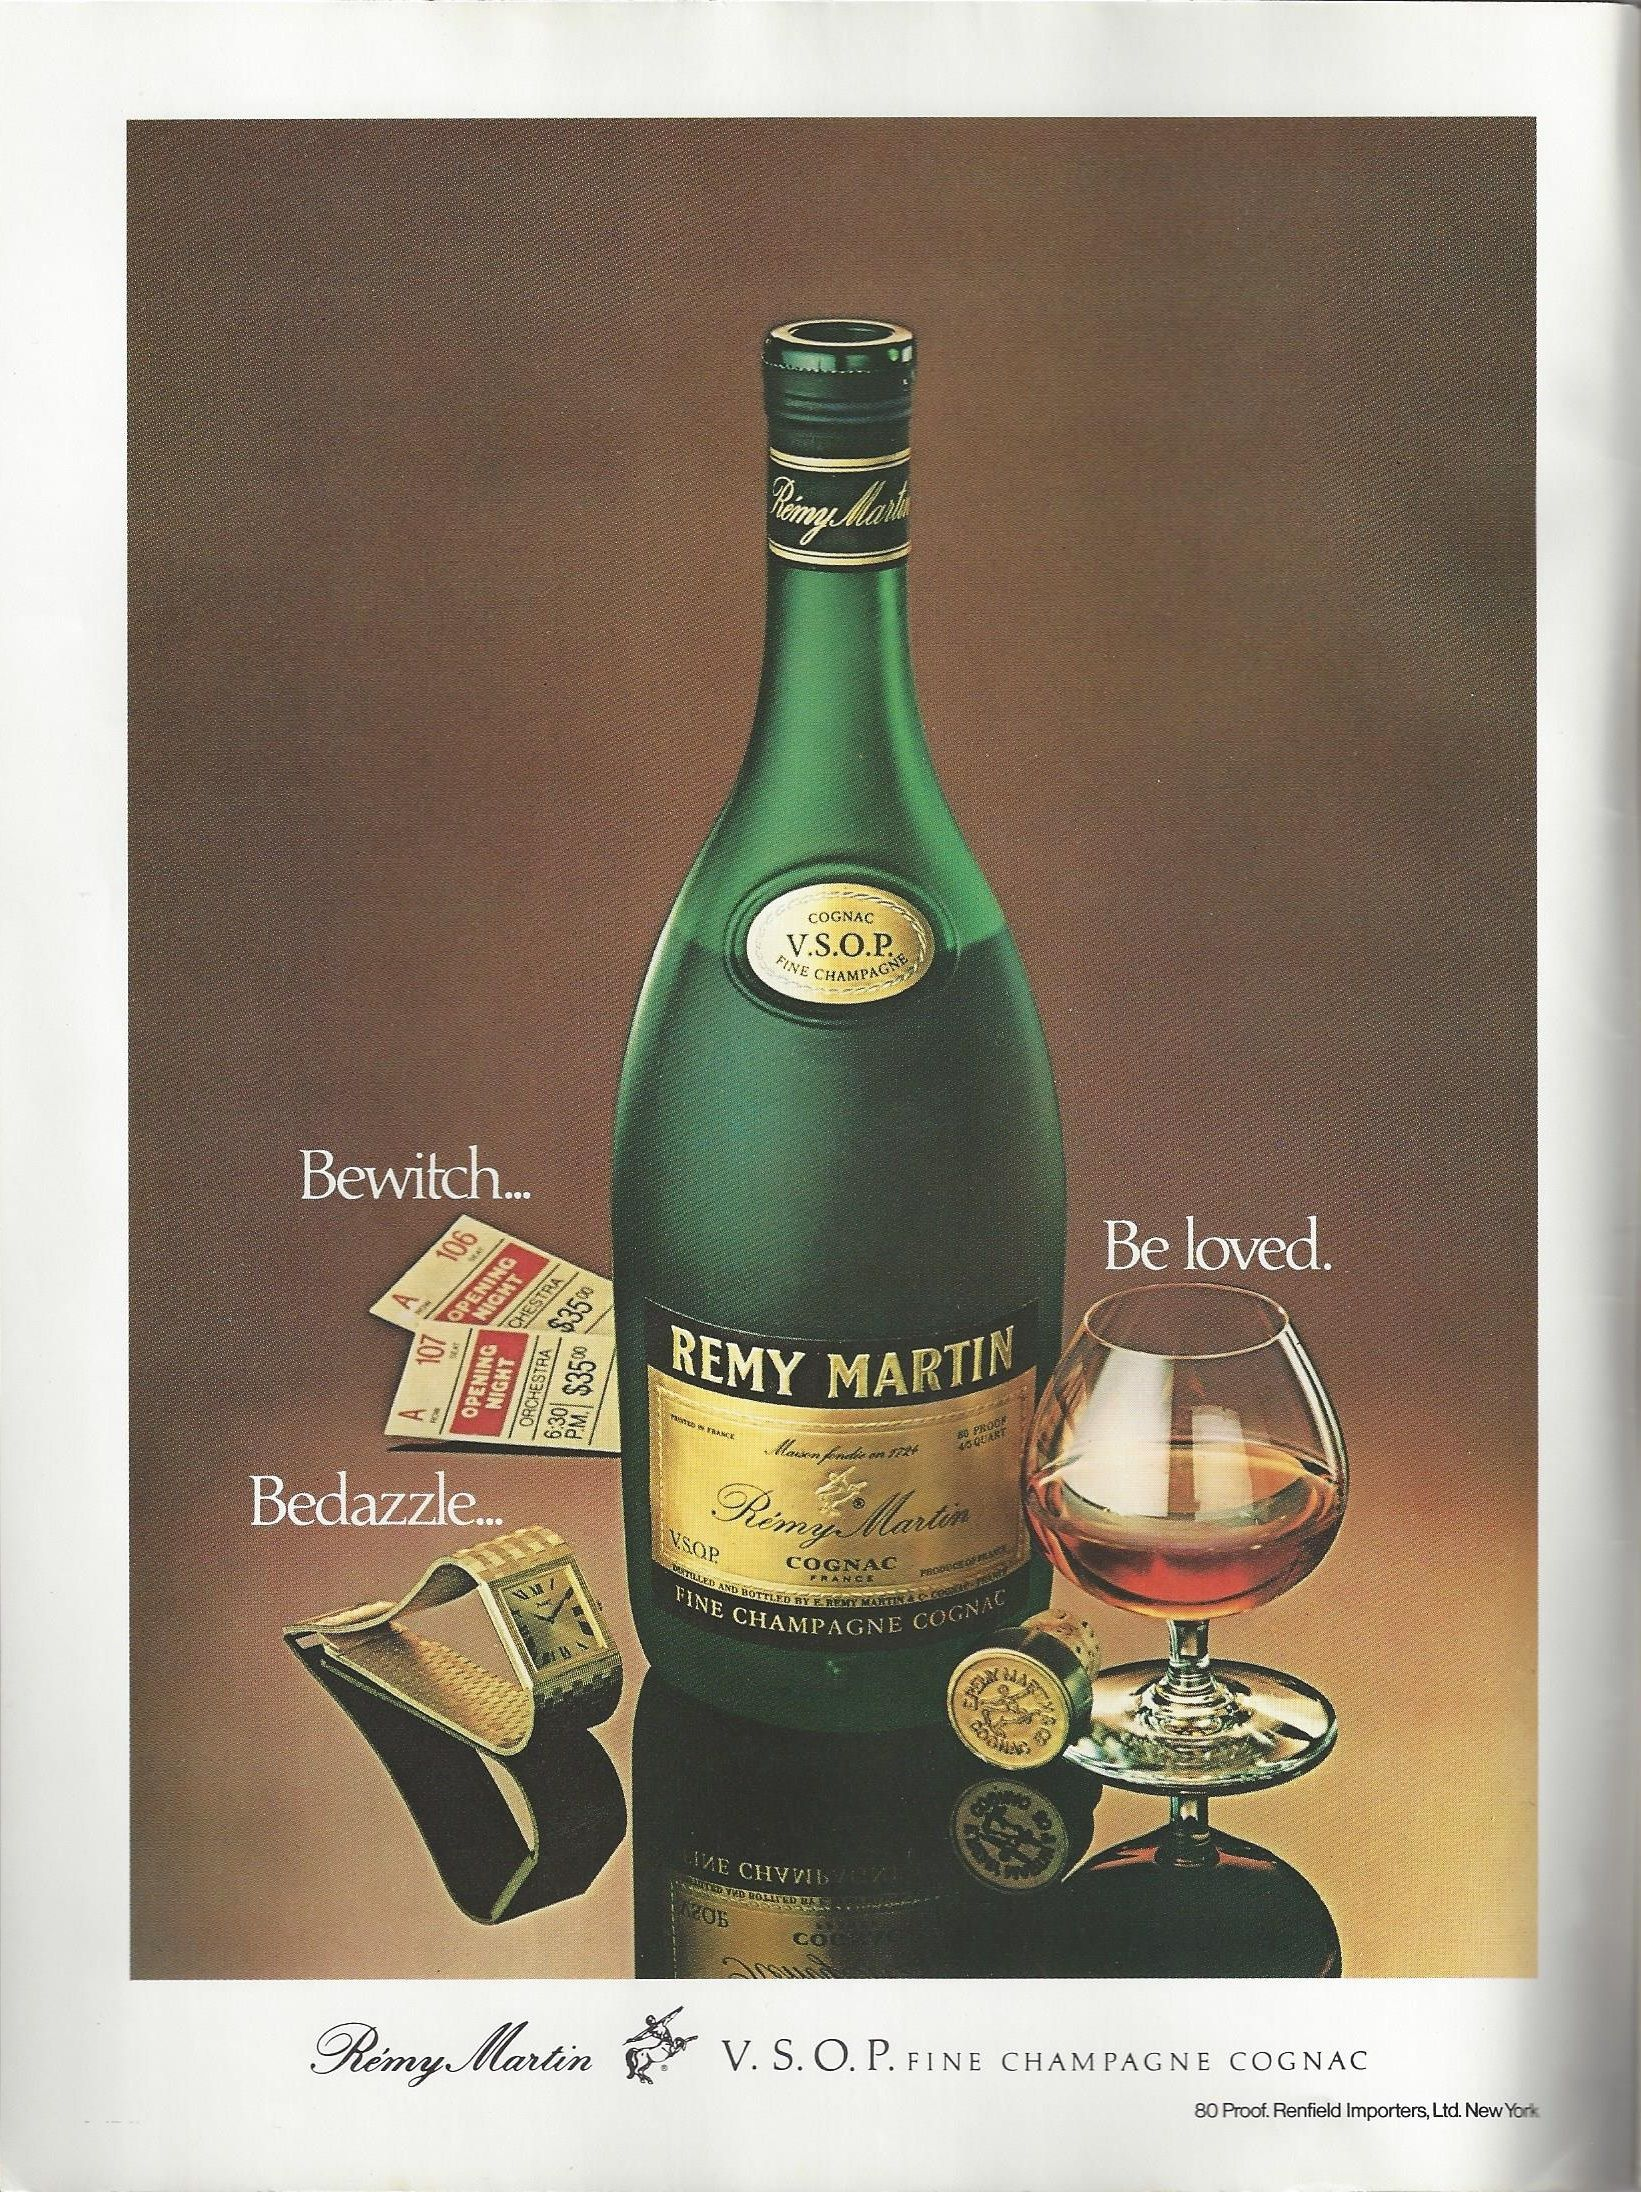 Remy Martin VSOP cognac (1979) | 1970s Print Advertising